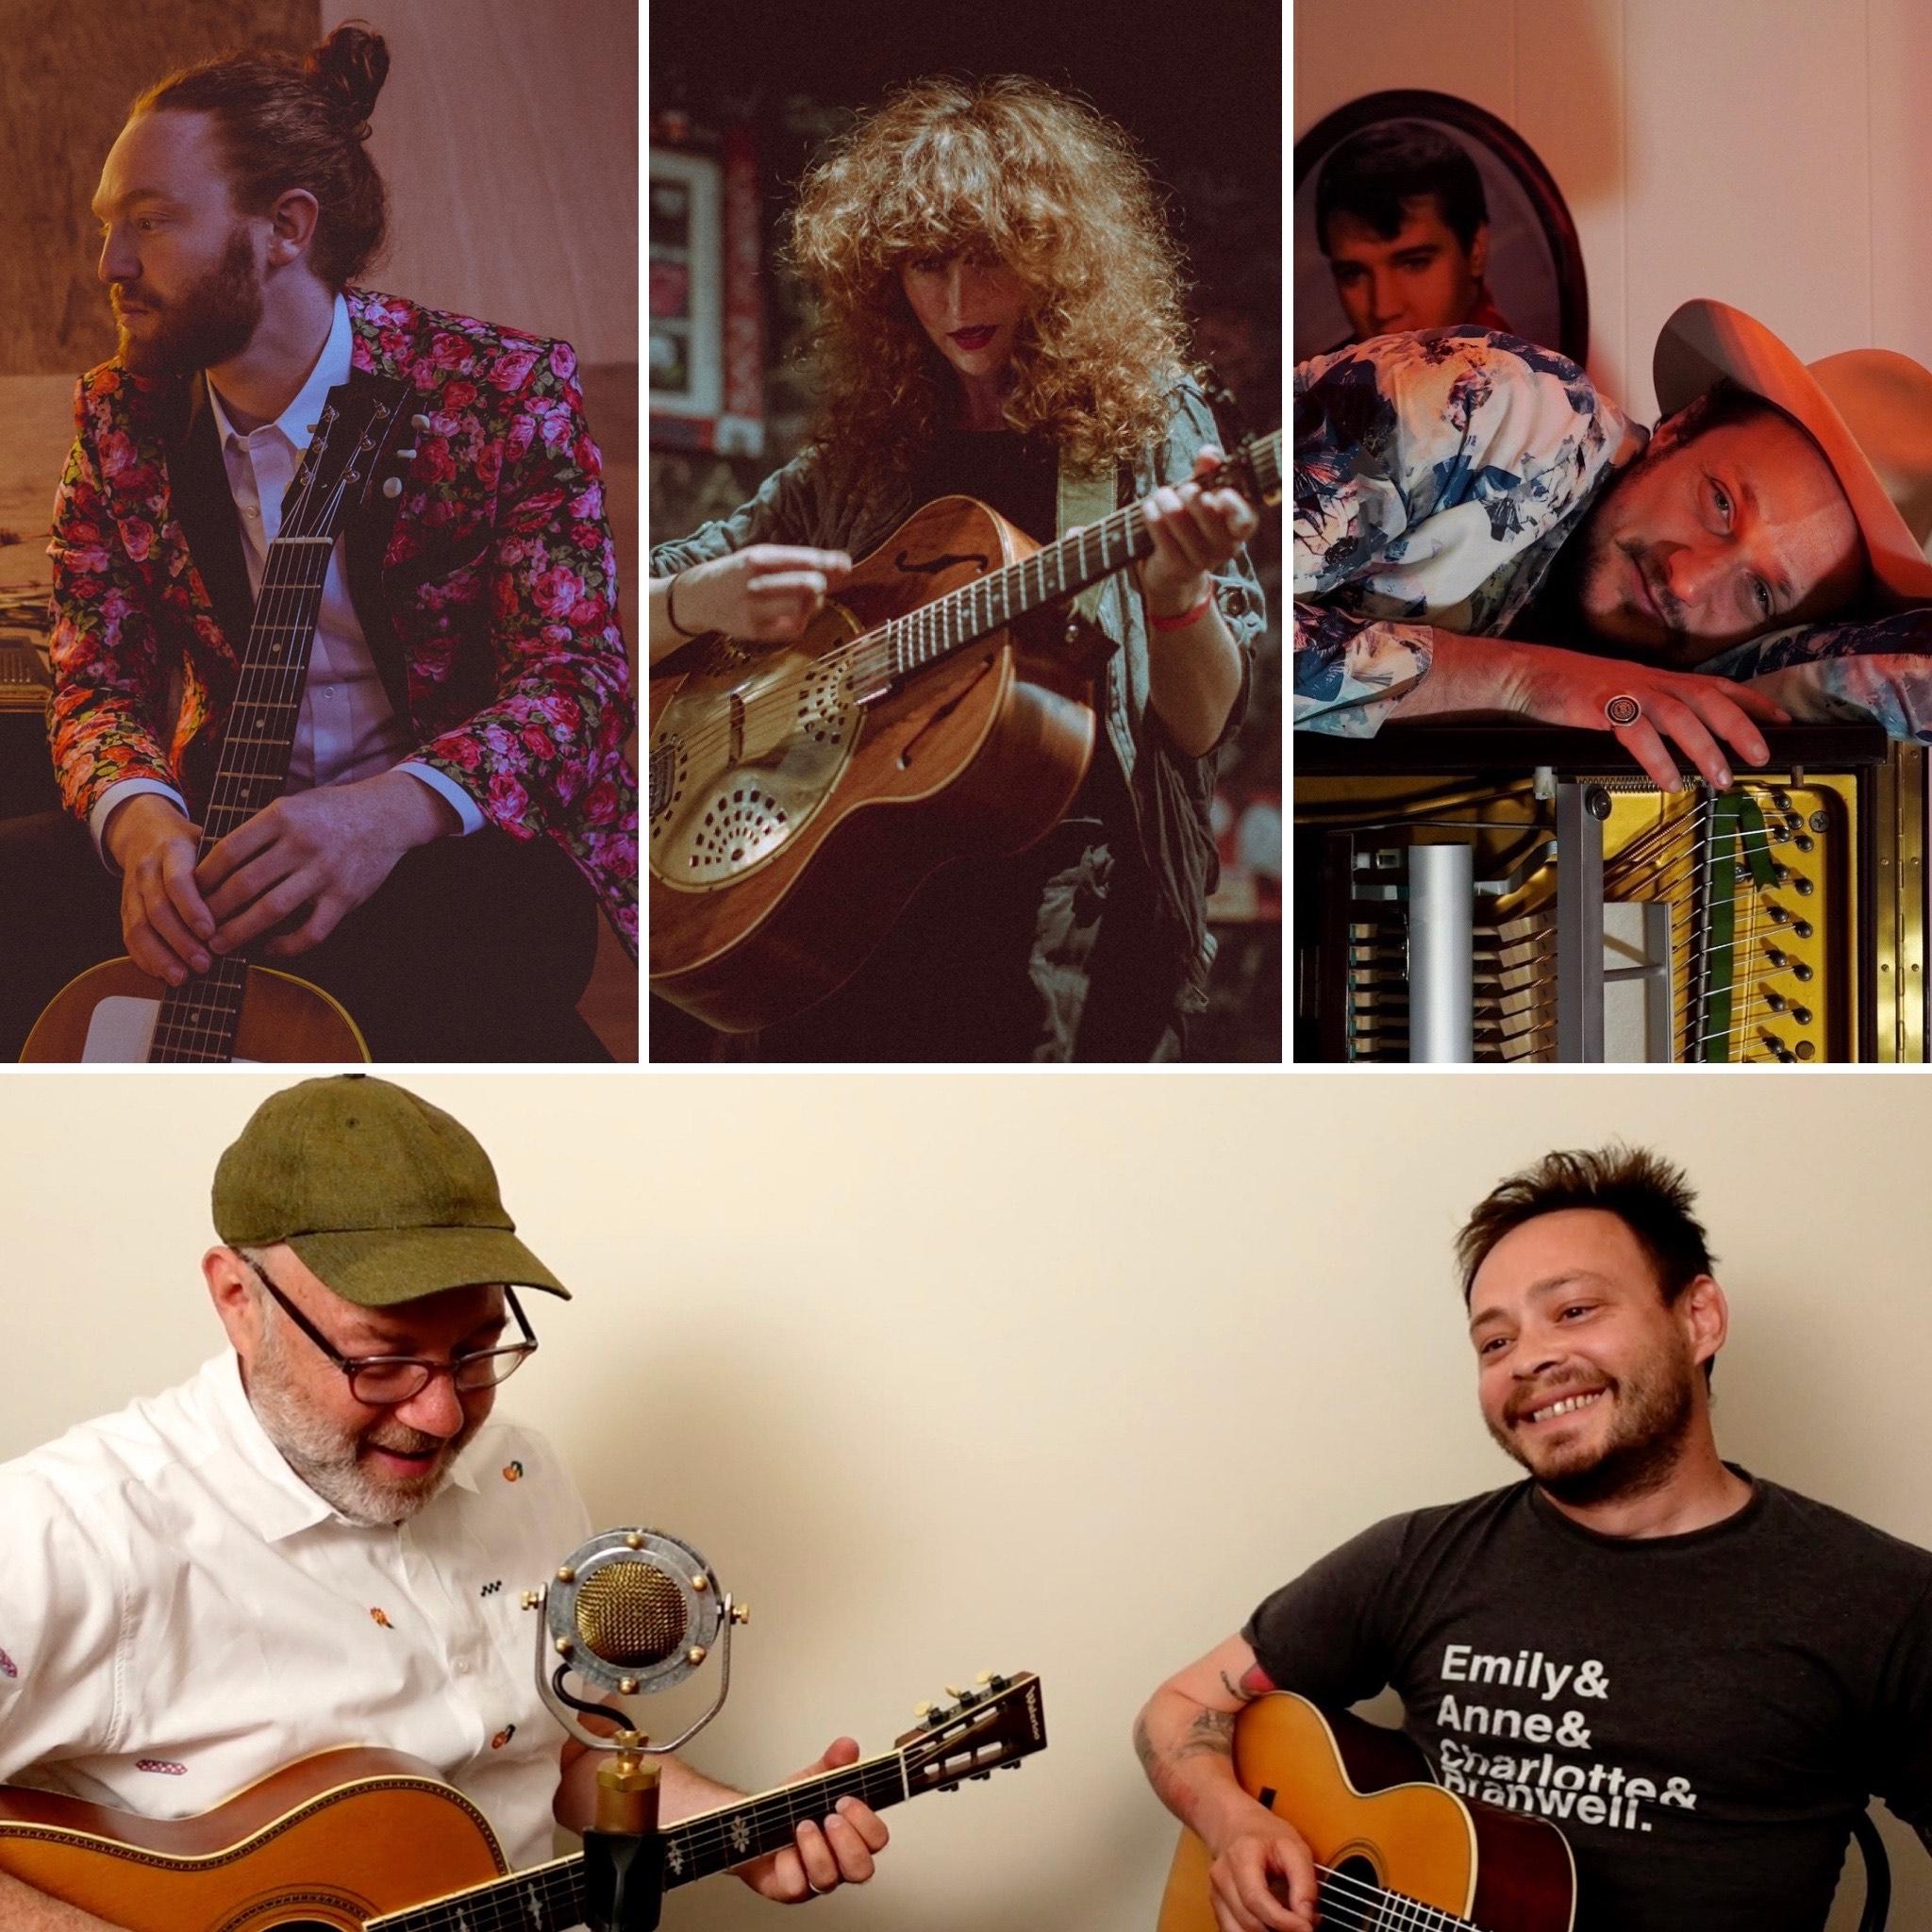 King Dream, Caitlin Gowdey, Adam Levy & Charlie Rauh: